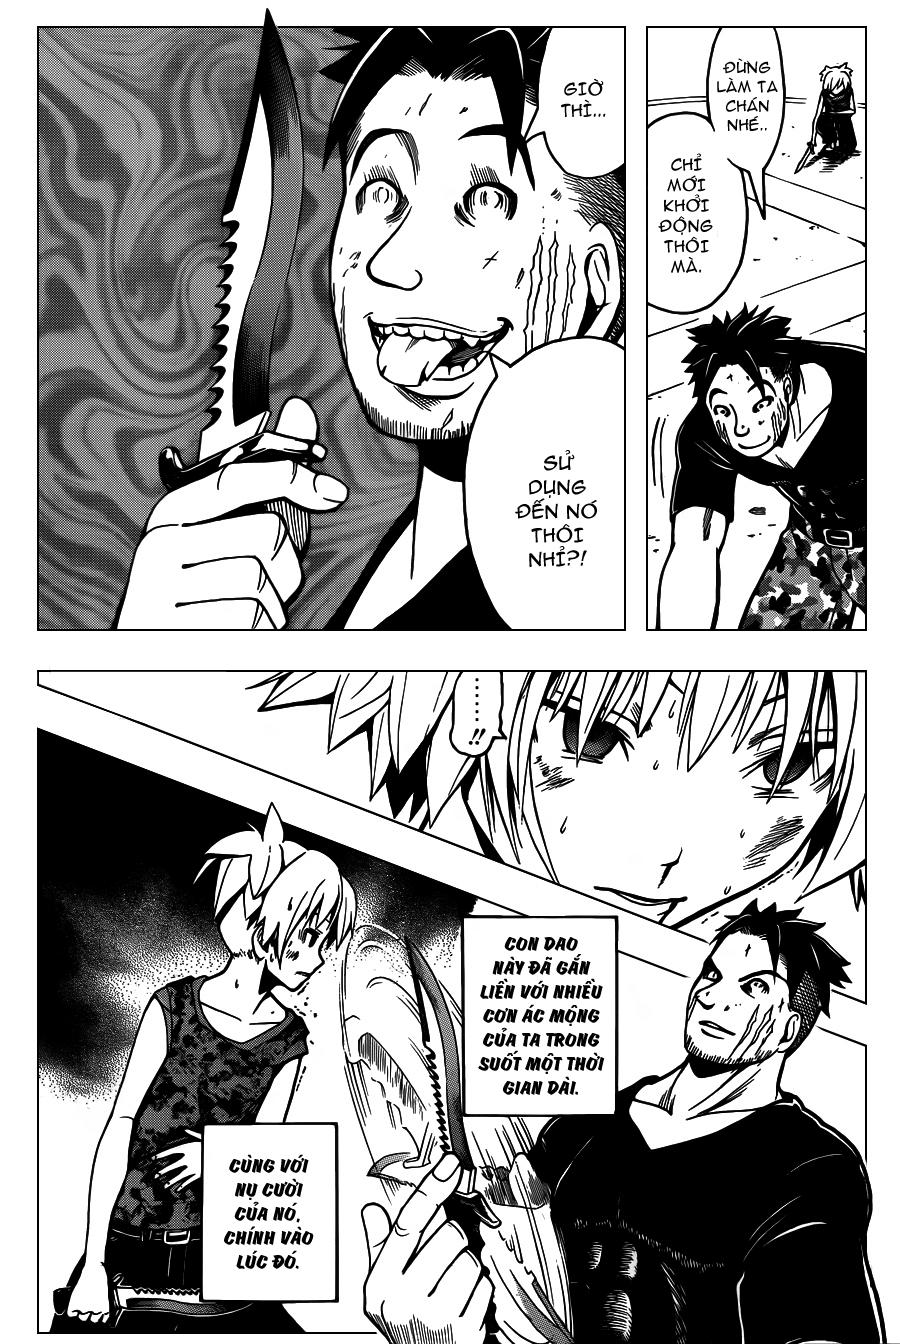 Ansatsu Kyoushitsu chap 71 trang 15